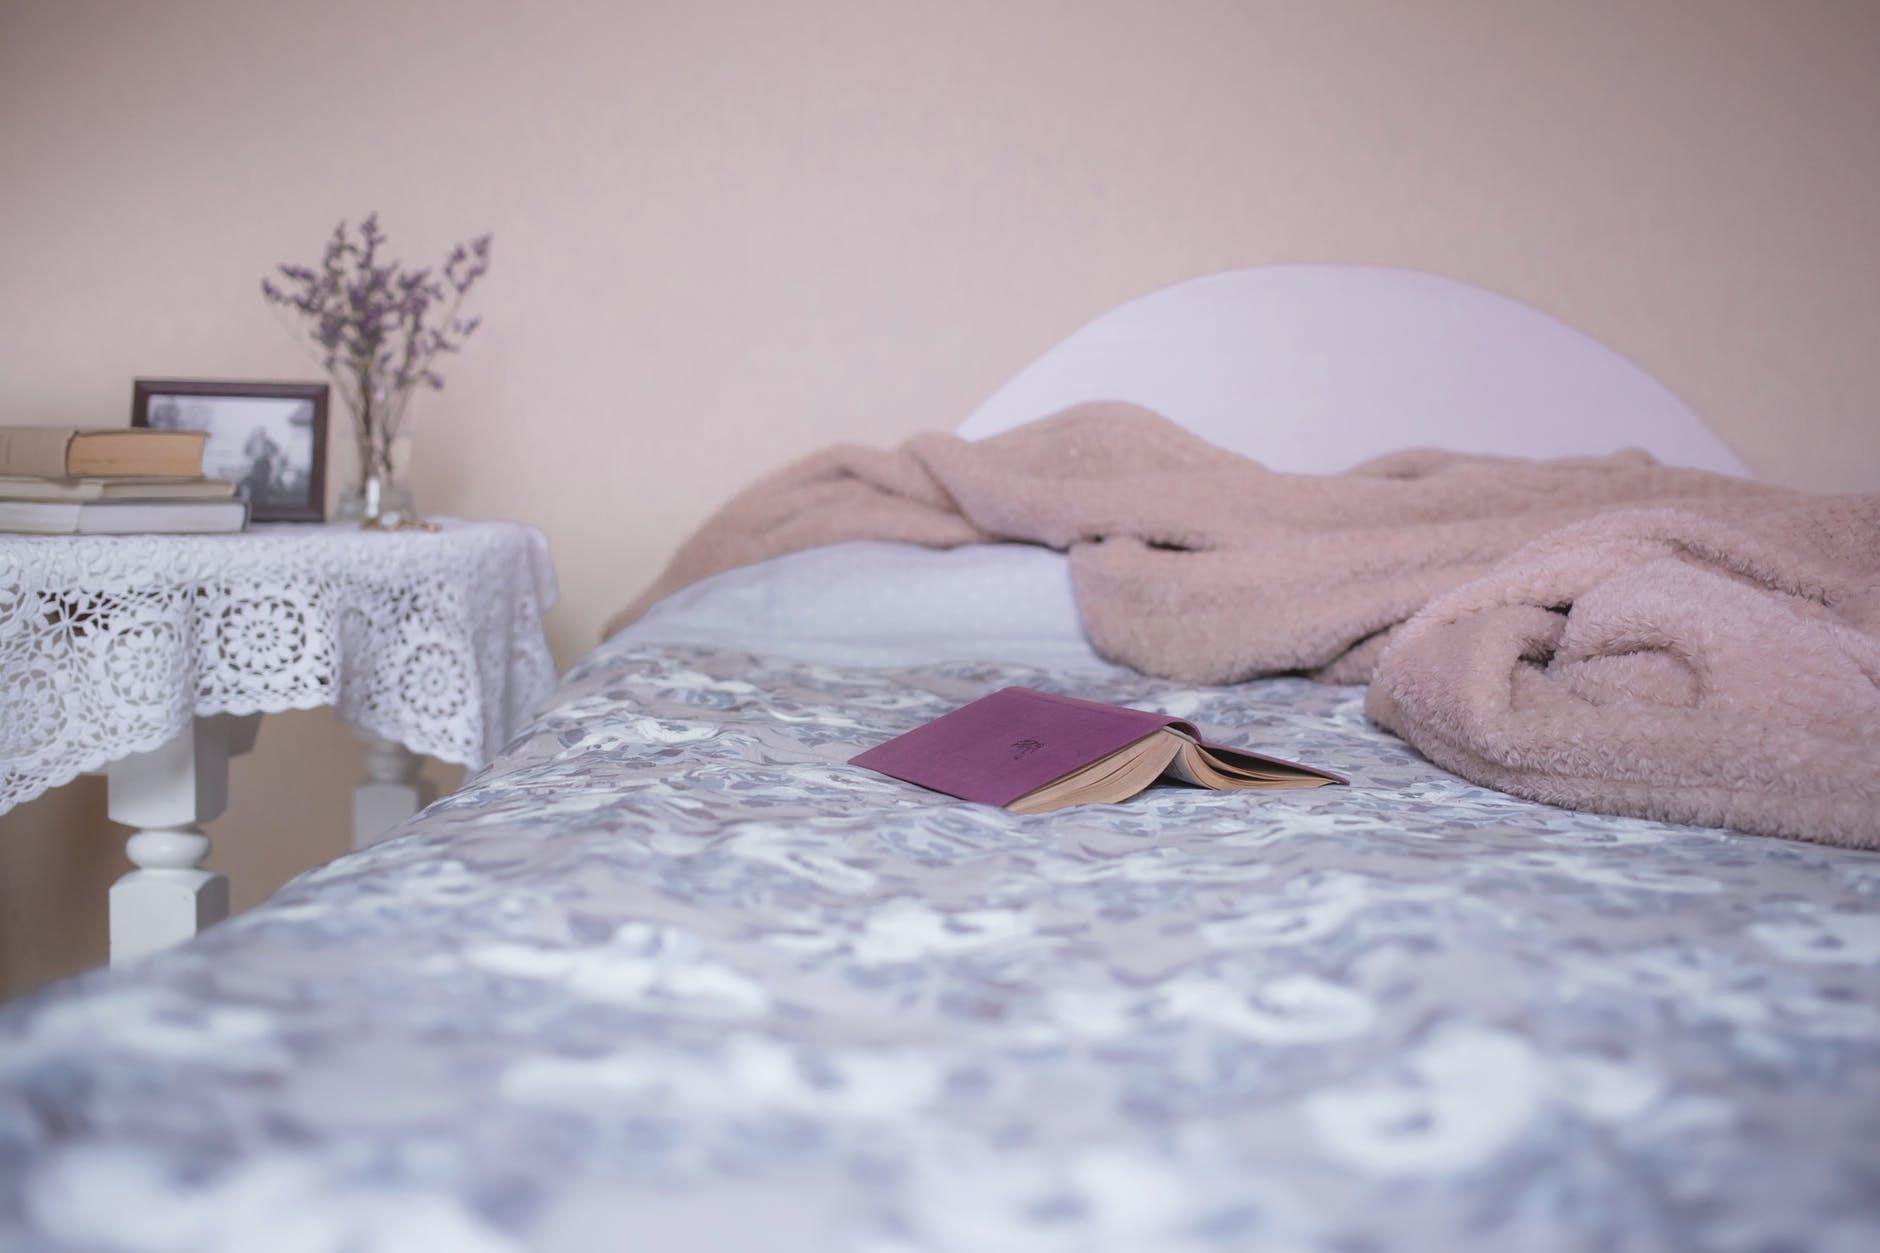 Sleeping, Bible, Rest